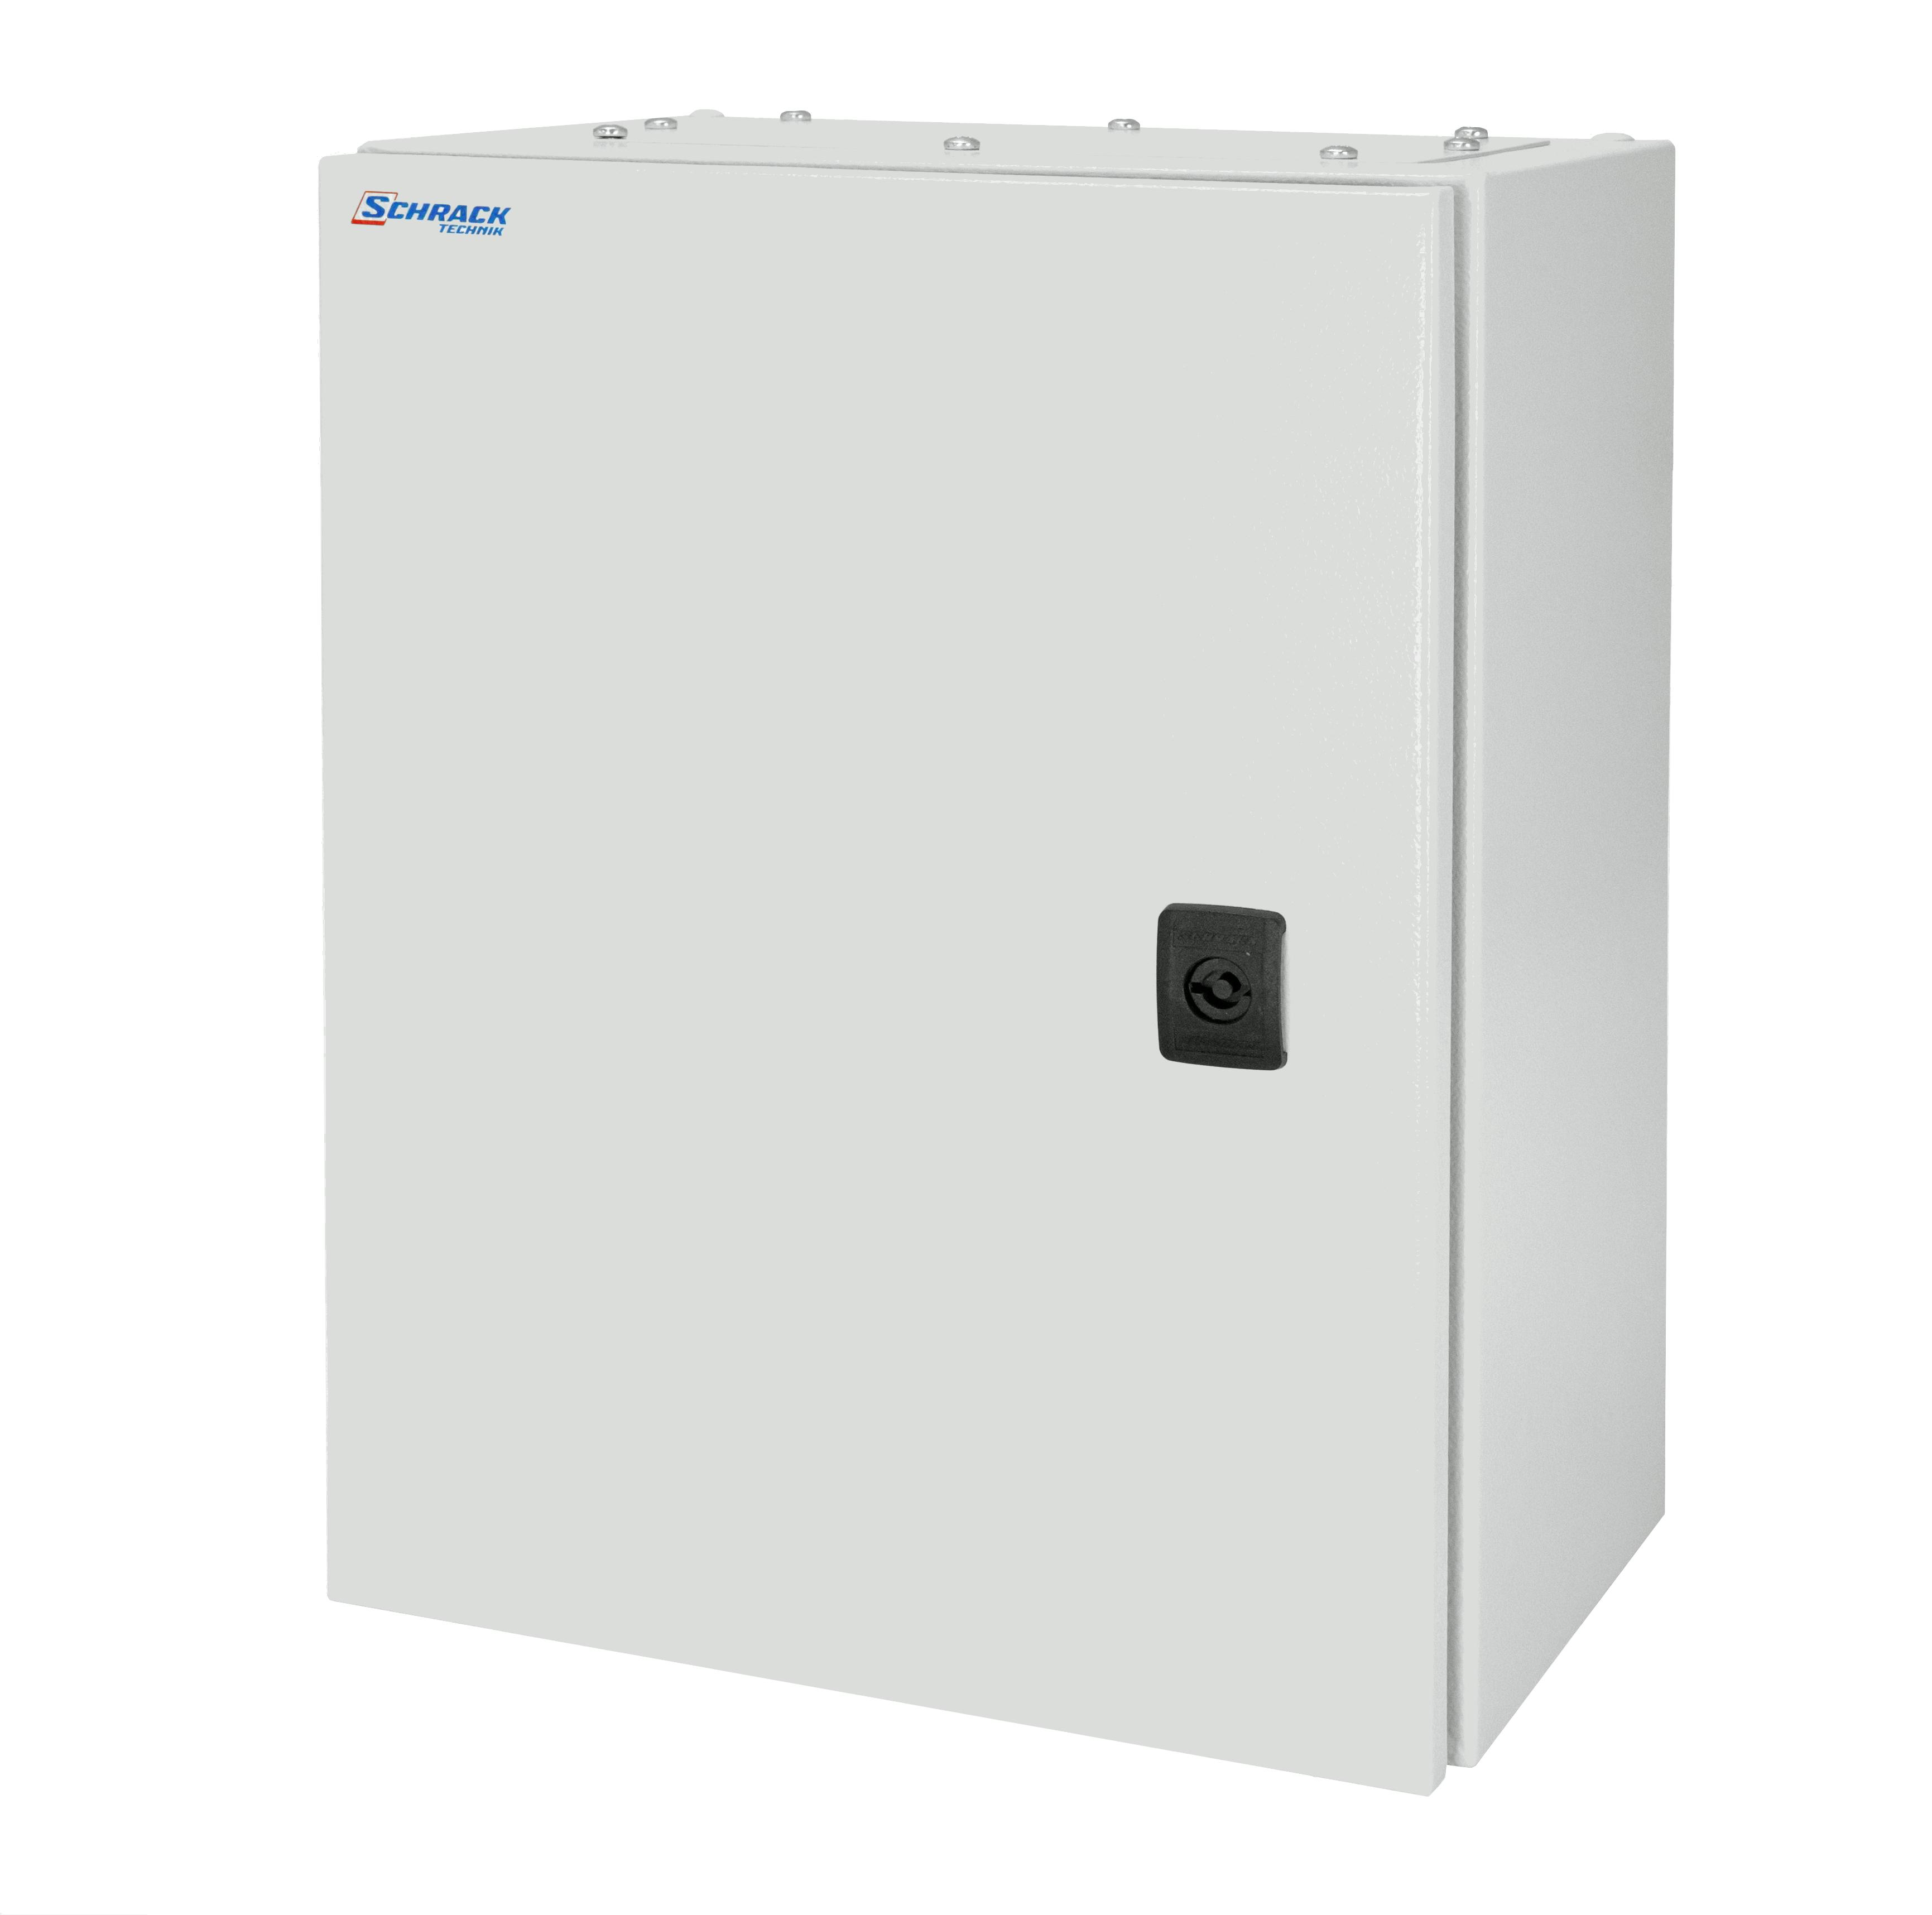 1 Stk Wandschrank Mono IP66 H=1200 B=800 T=400 Stahlblech WSM1208400